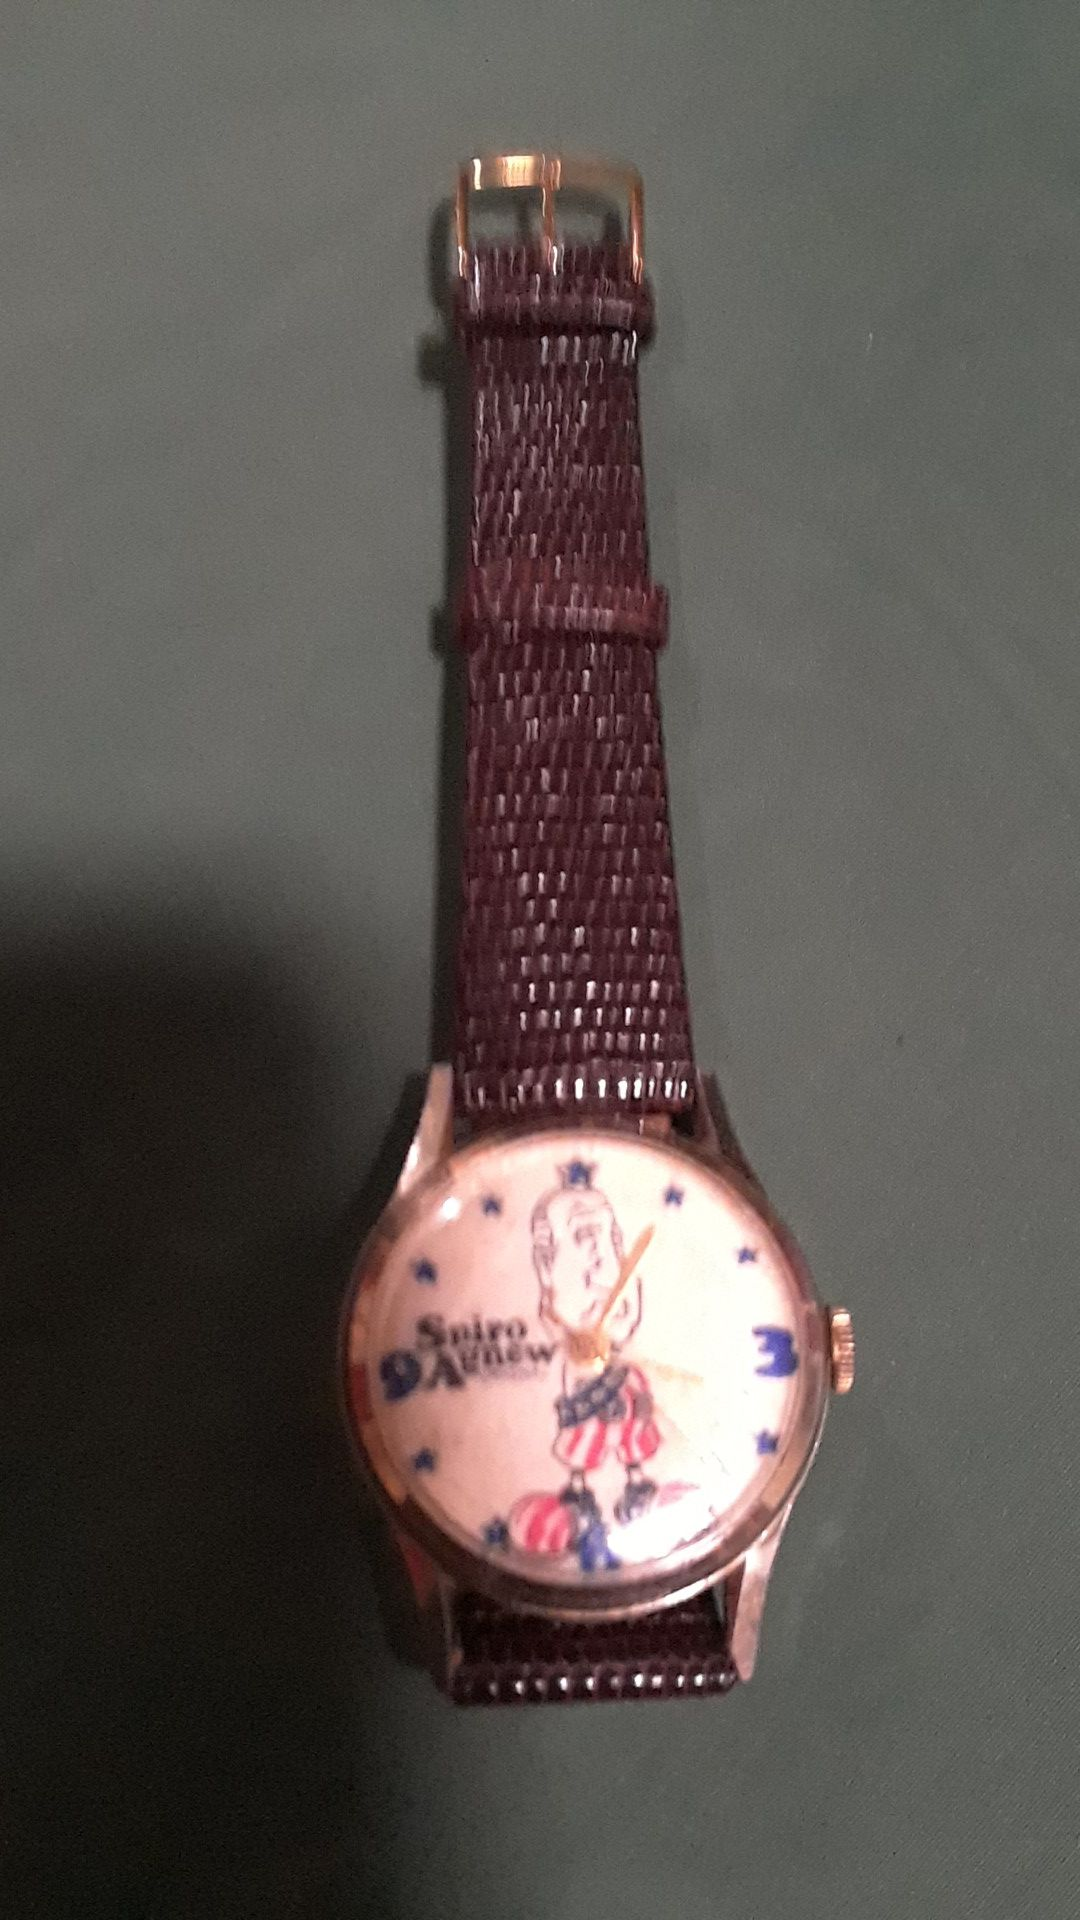 Vintage Spiro Agnew Watch